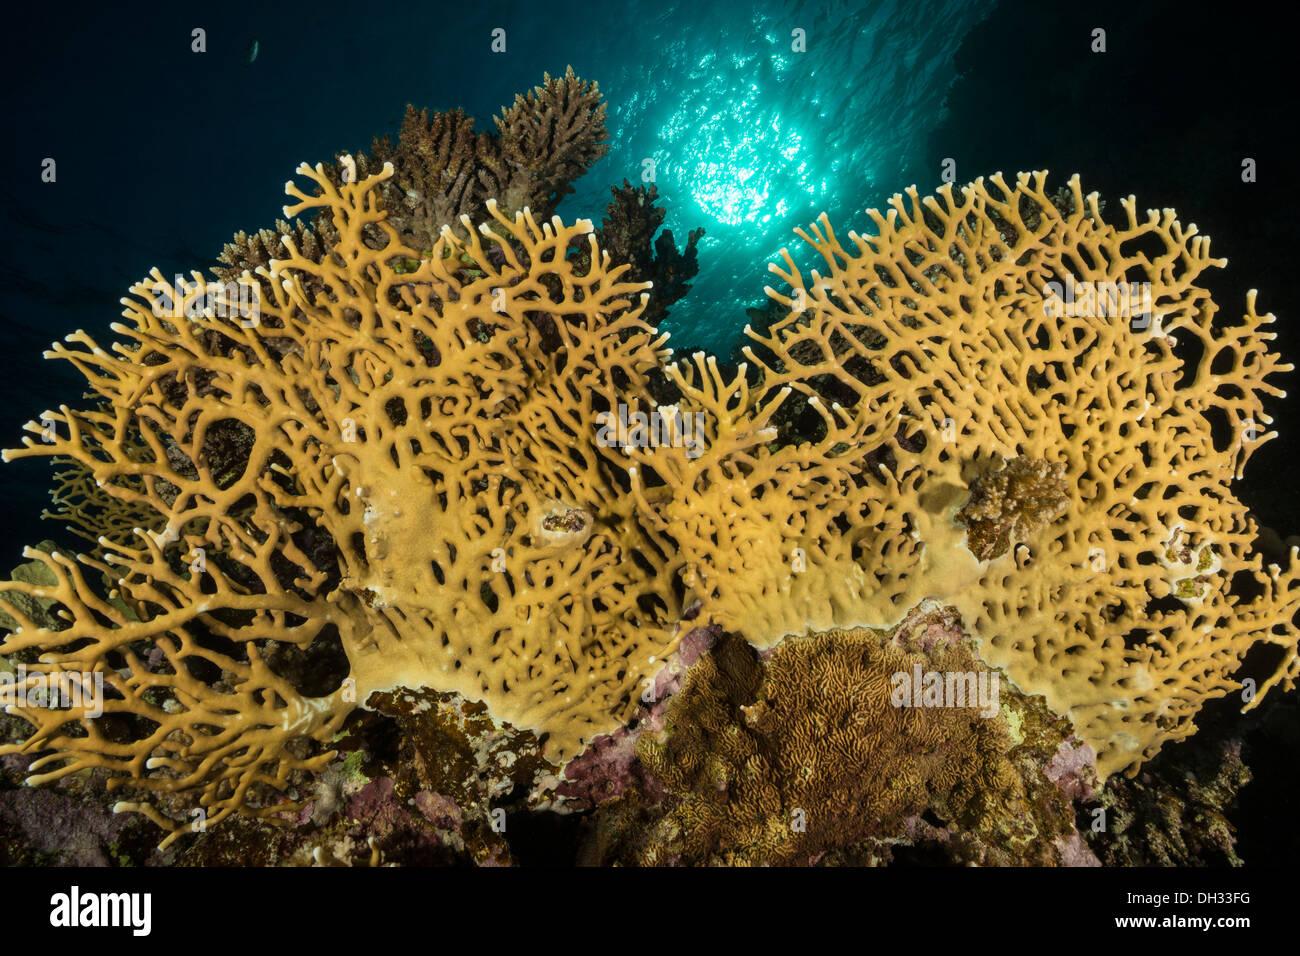 Fire Coral, Millepora dichotoma, Marsa Shagra, Red Sea, Egypt - Stock Image